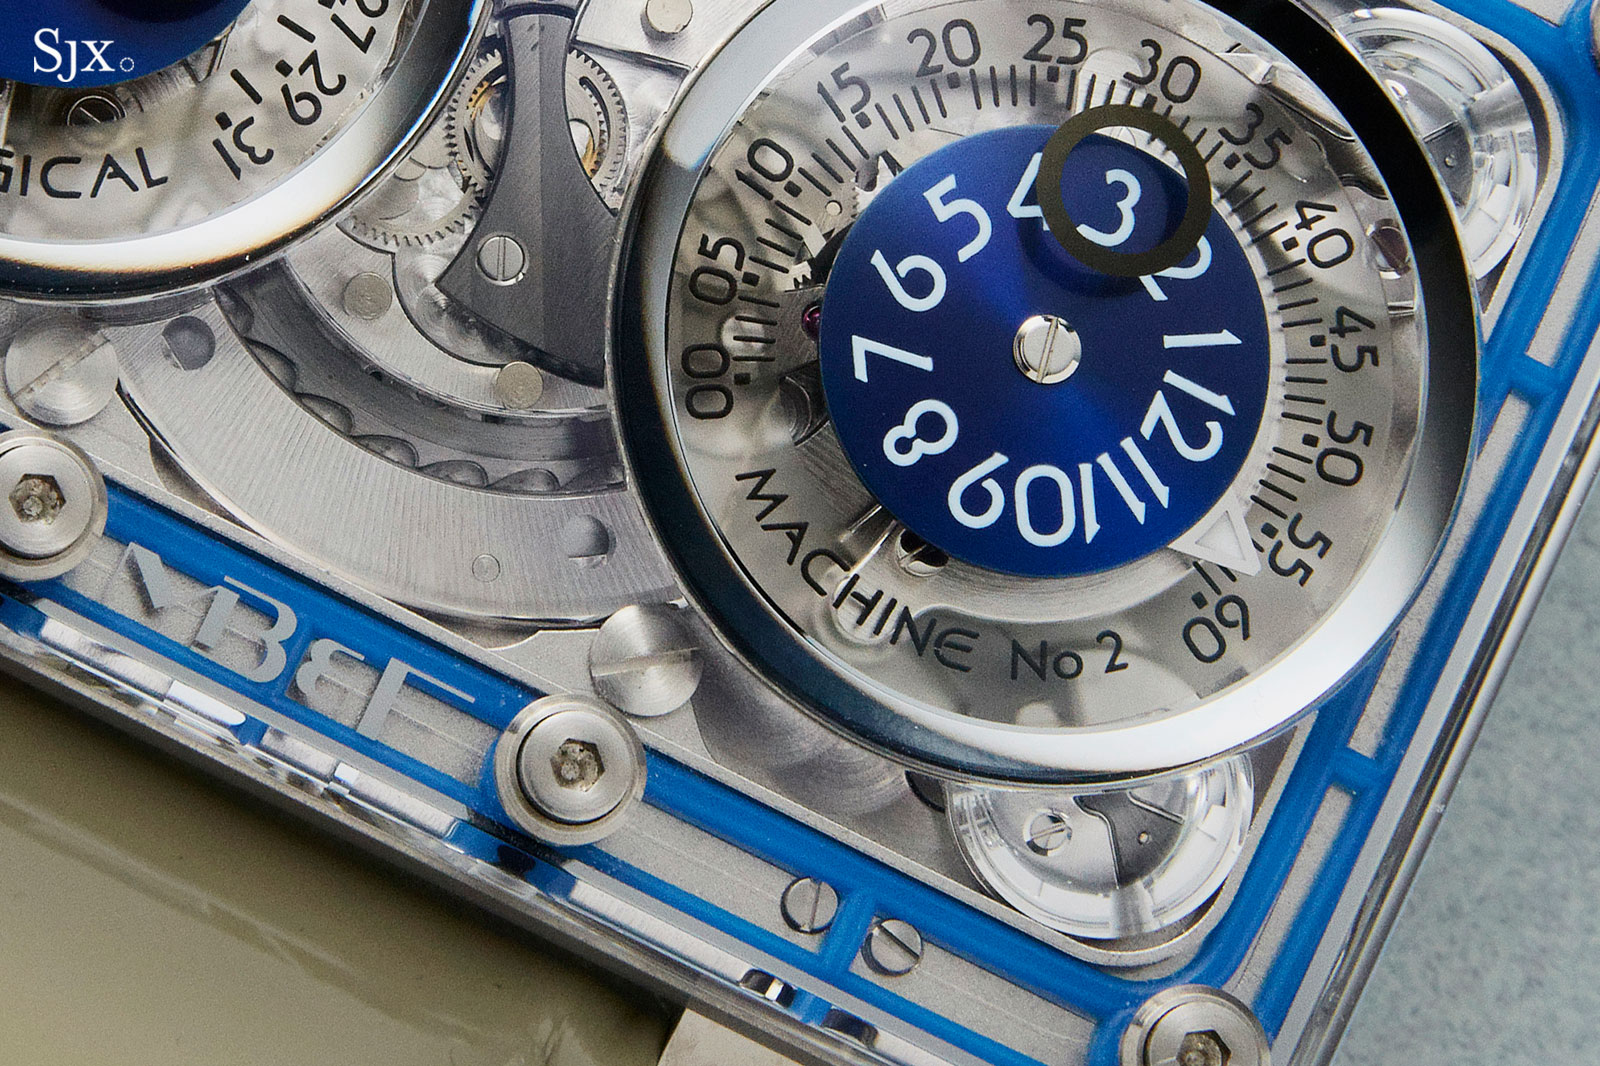 MB&F HM2 SV blue 1